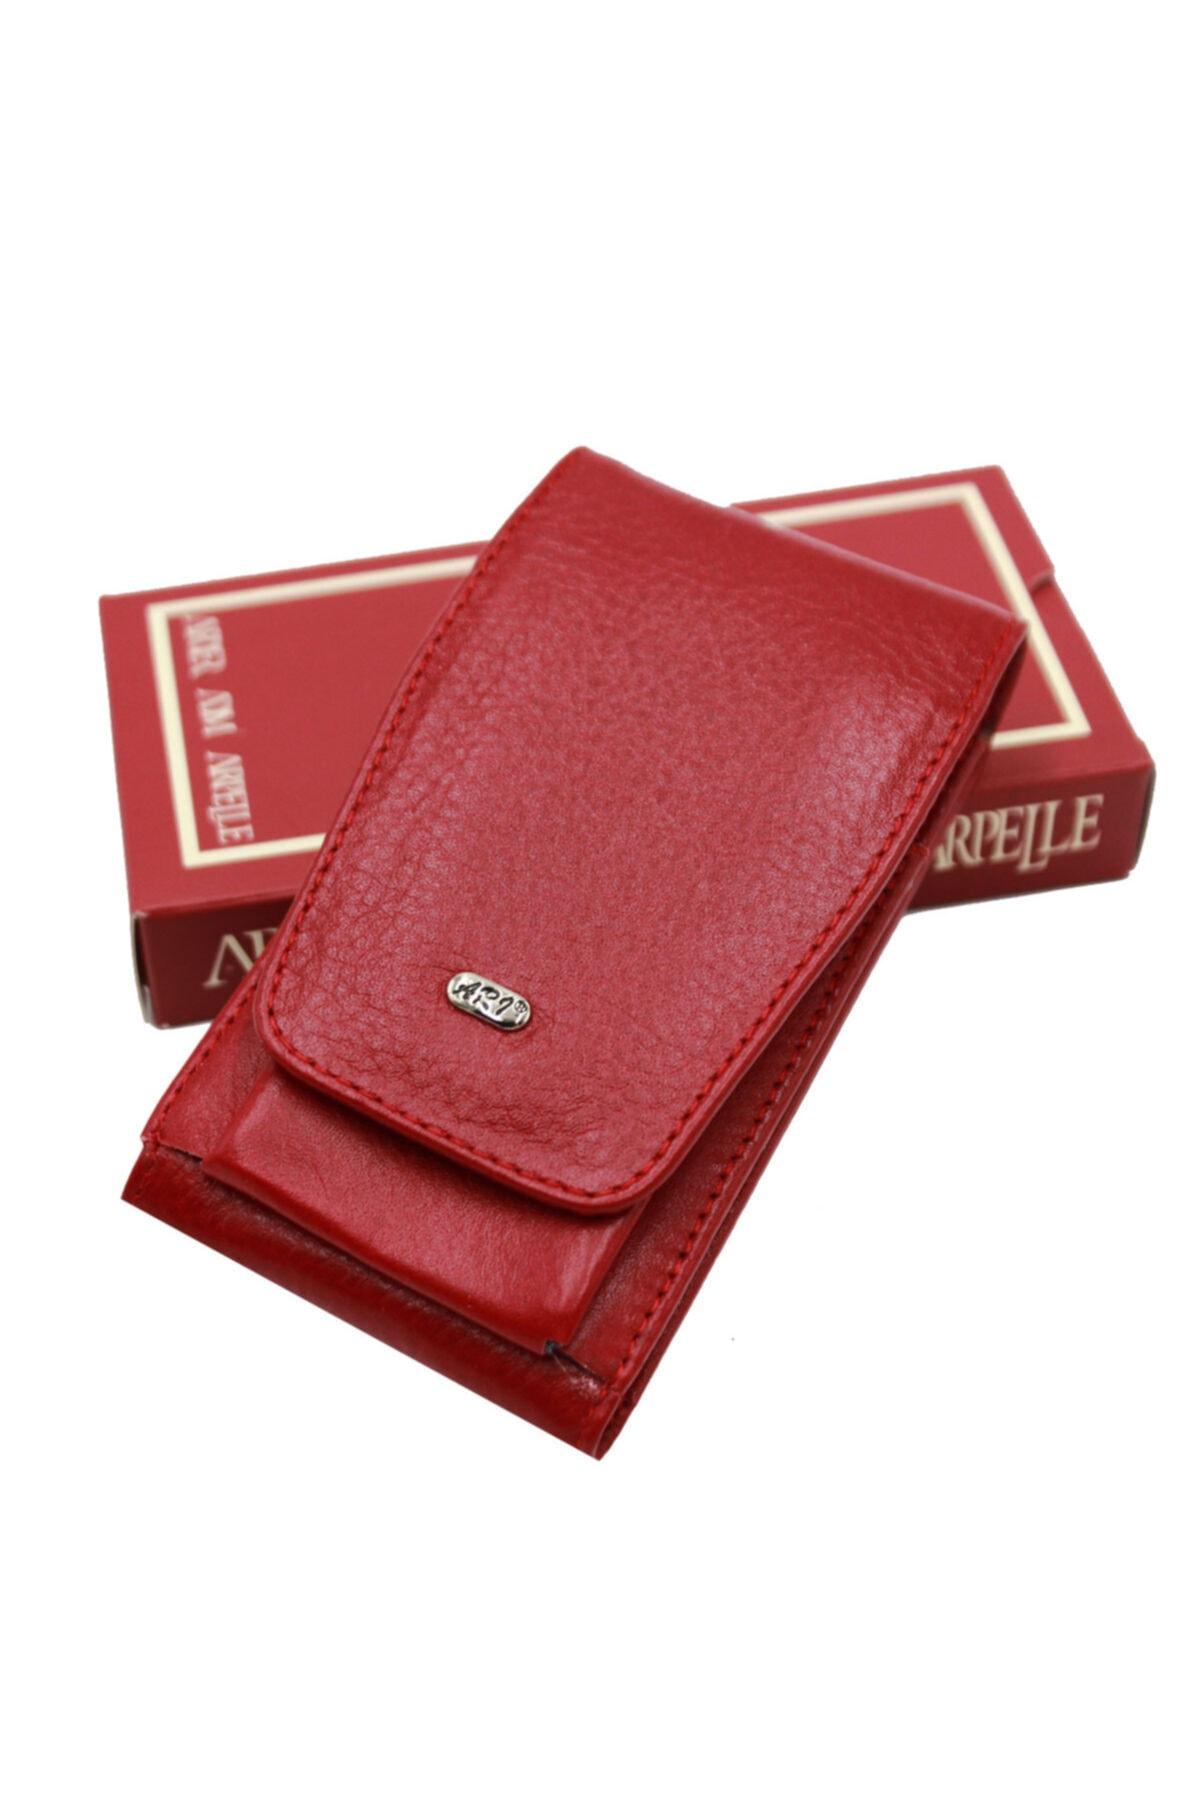 New Fashion Genuine Leather Case Wallet Cigarette Box Lighter Holder Women Men Unisex Tobacco Gift S